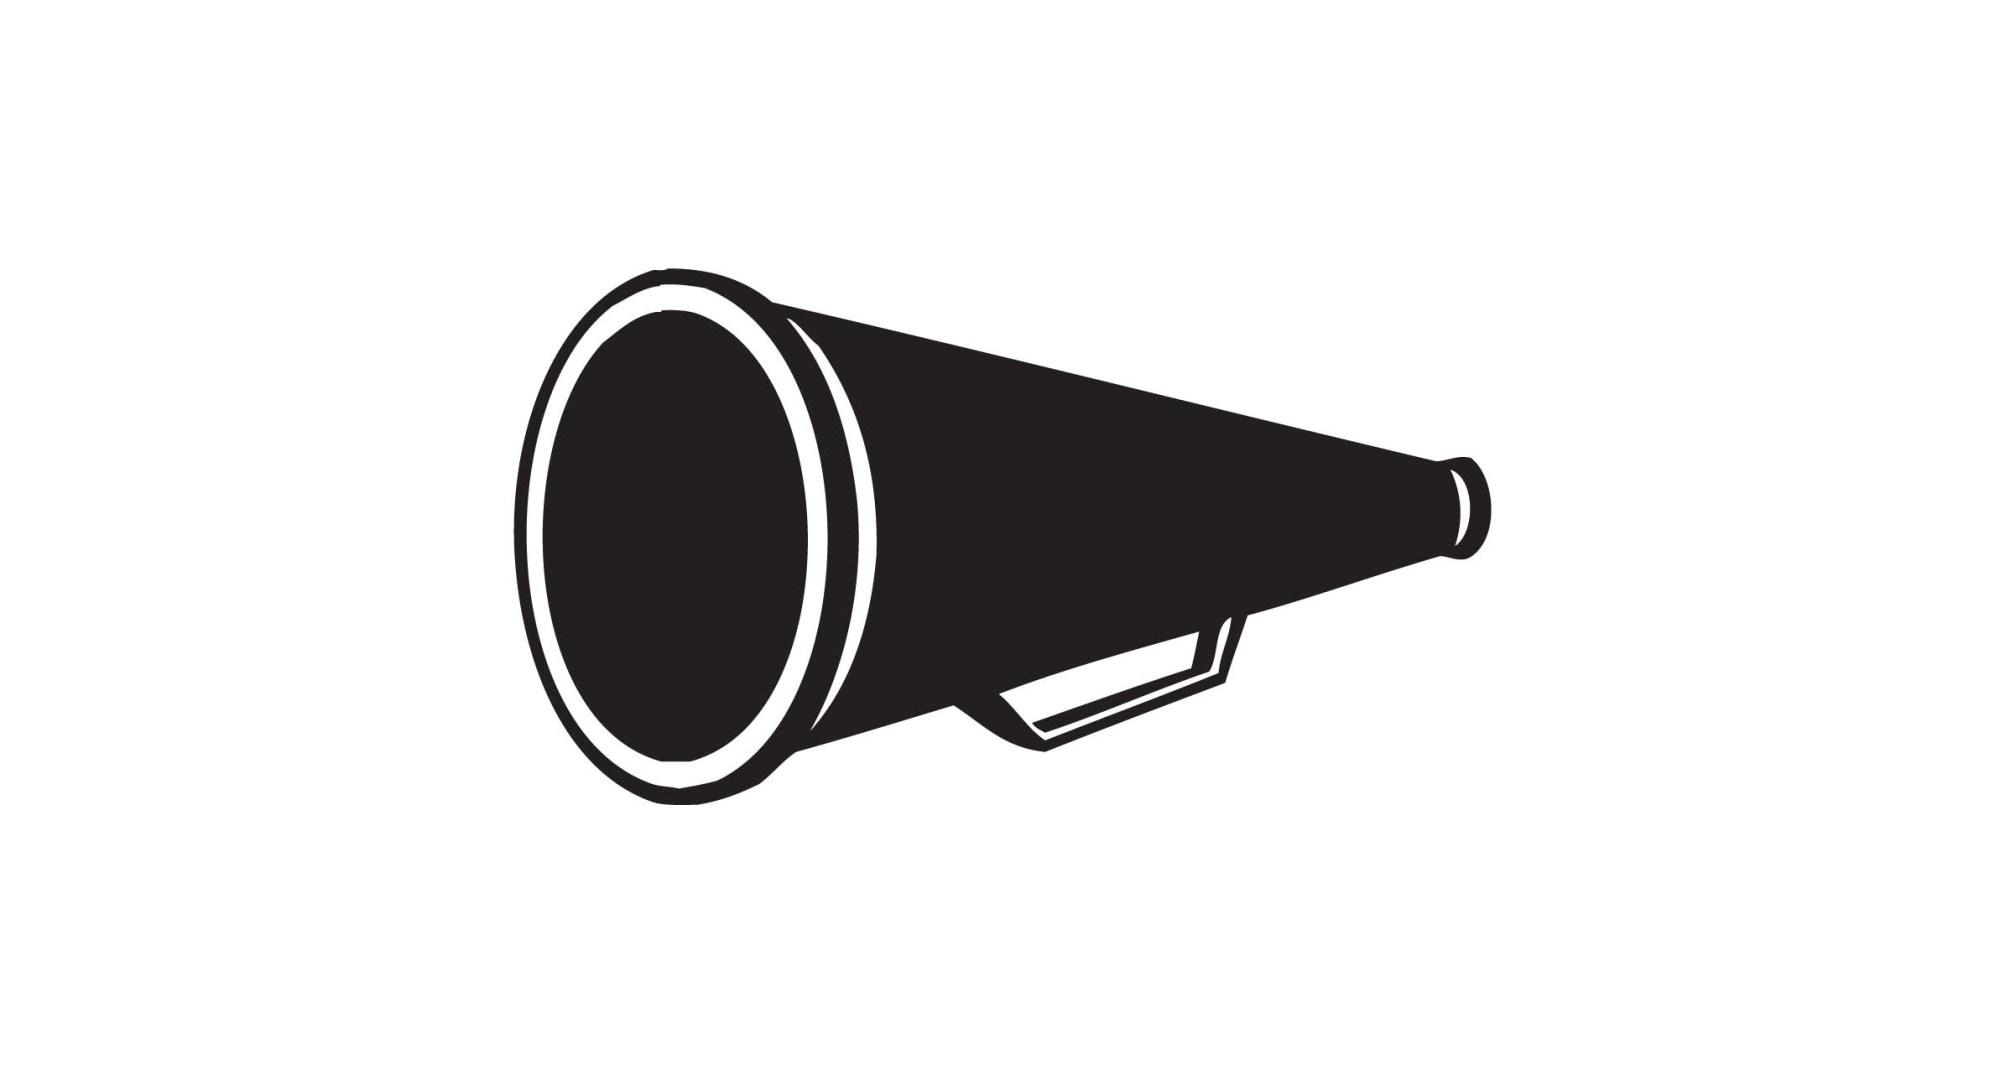 hight resolution of cheer megaphone cheerleader megaphone clipart cheerleading